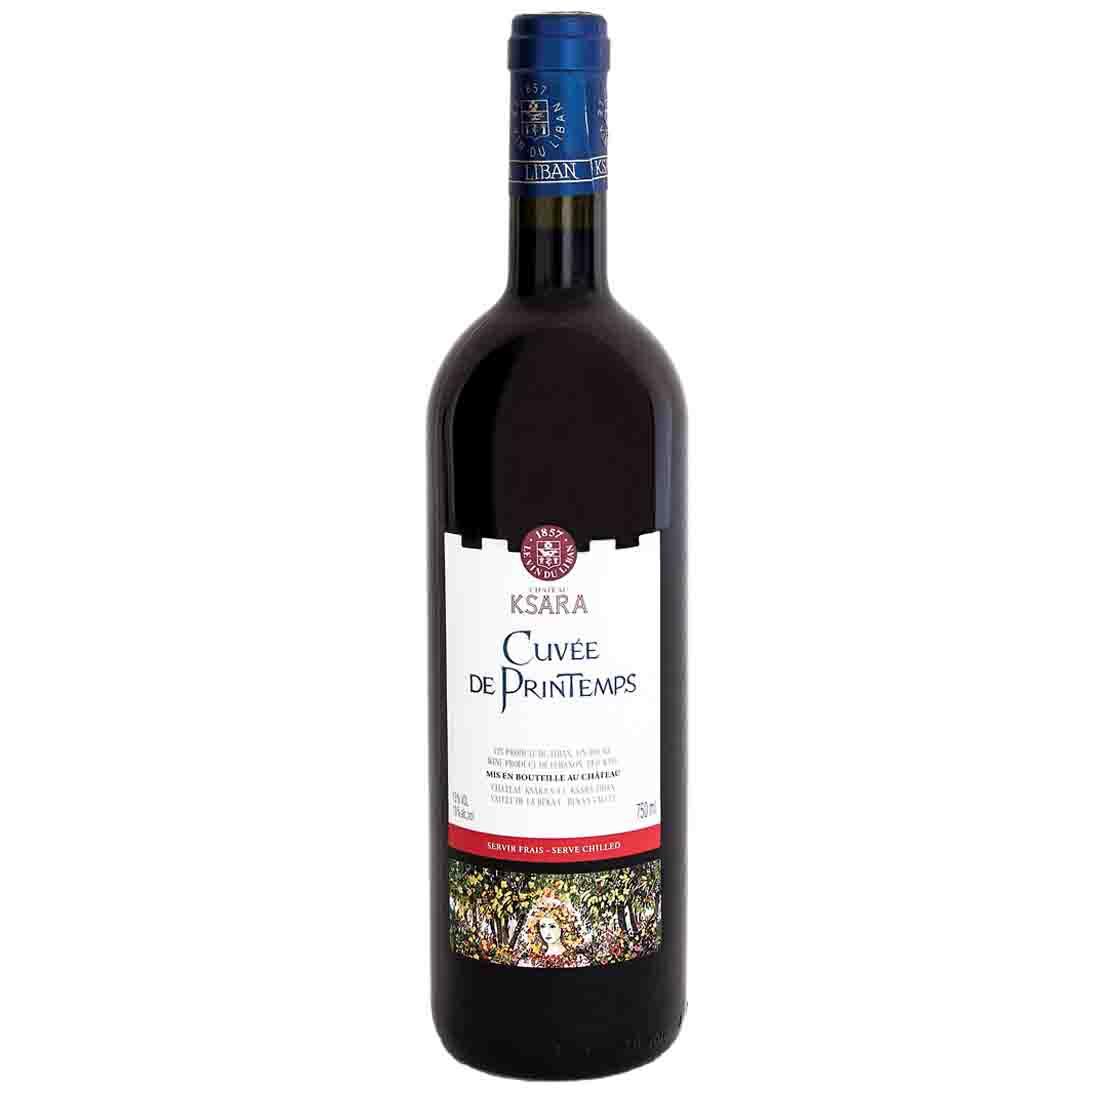 chateau ksara refreshing chilled Lebanese red wine cuvee du printemps gamay tempranillo bekaa valley